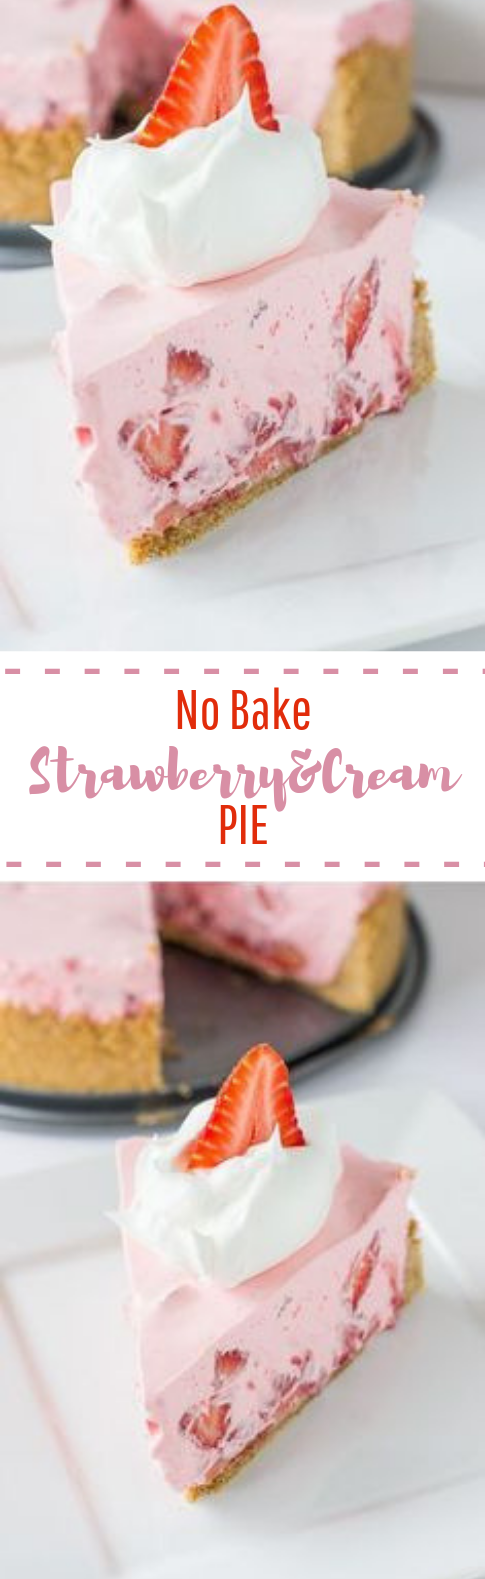 No-Bake Strawberry And Cream Pie #sweet #dessert